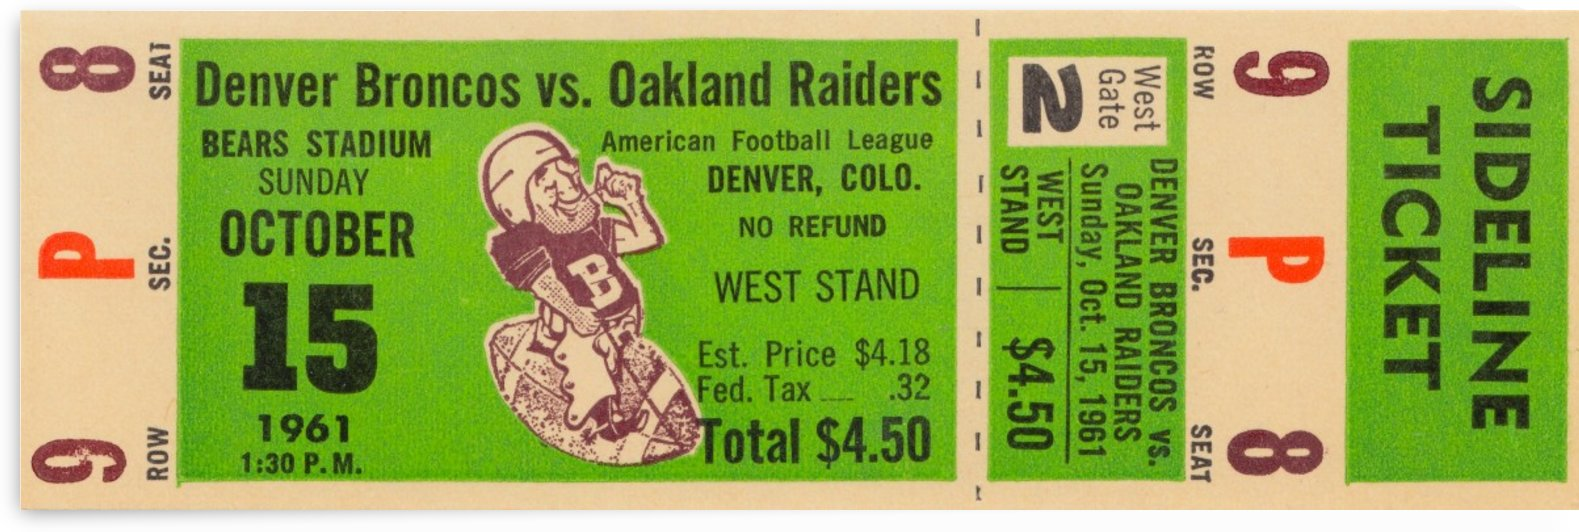 1961 oakland raiders denver broncos afl ticket stub art by Row One Brand